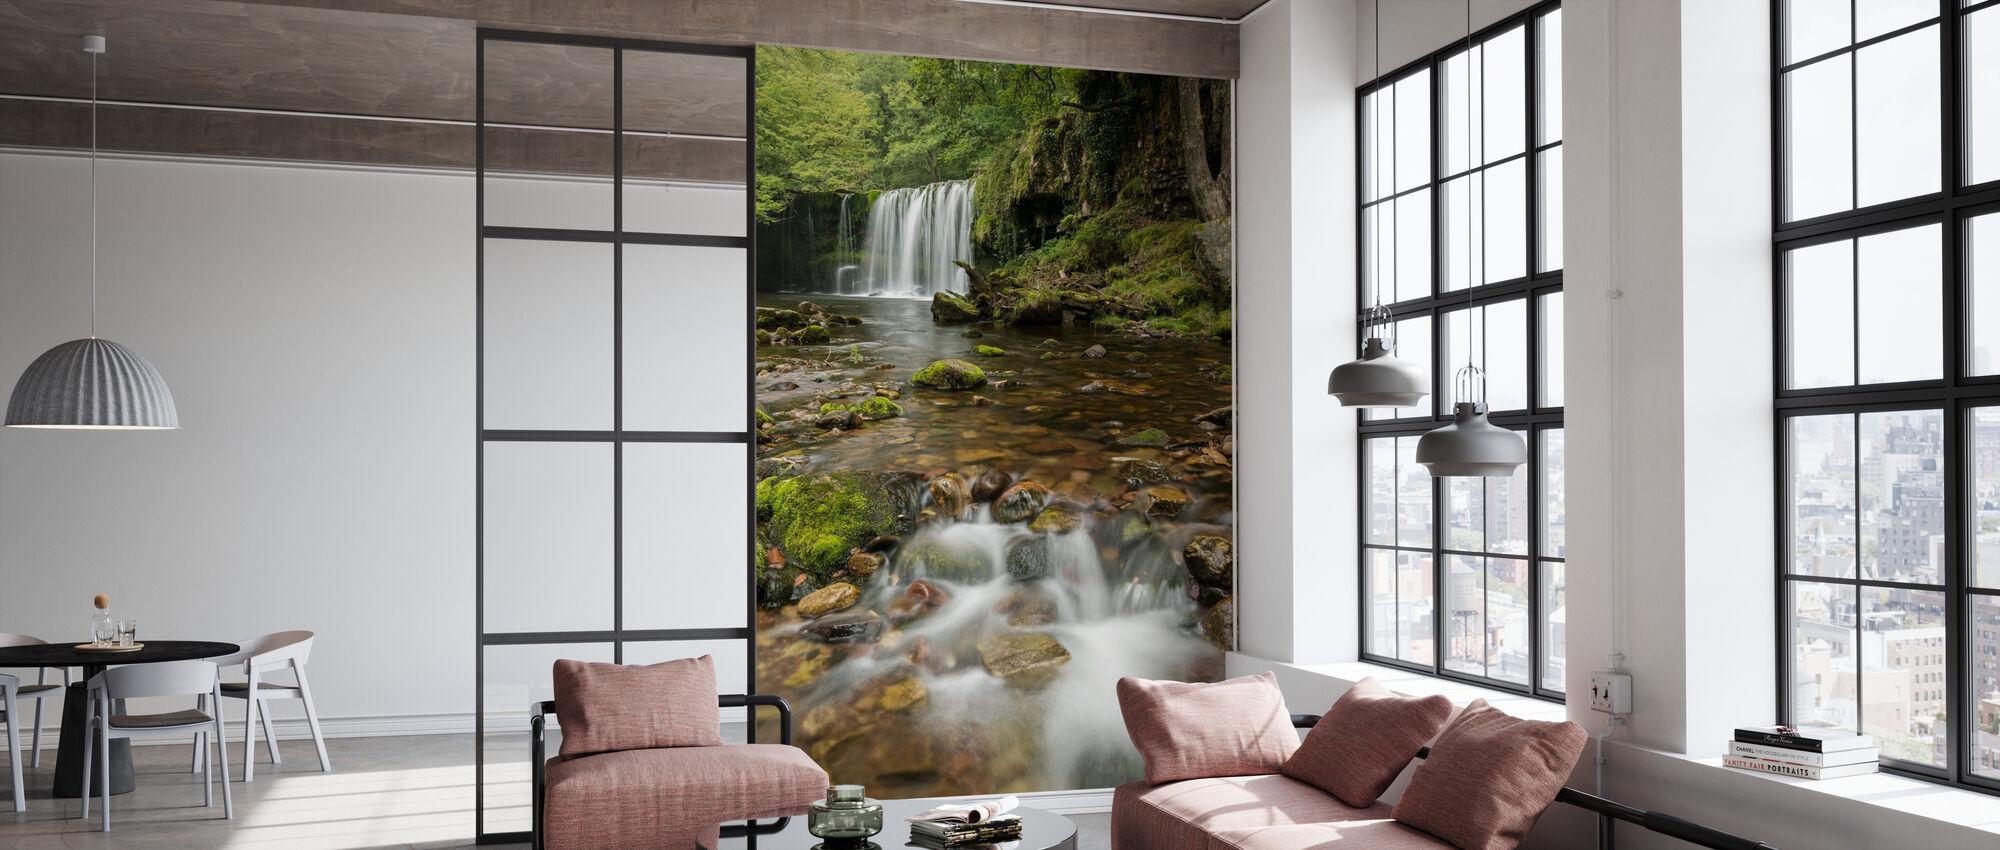 Clear Water Stream - Wallpaper - Office